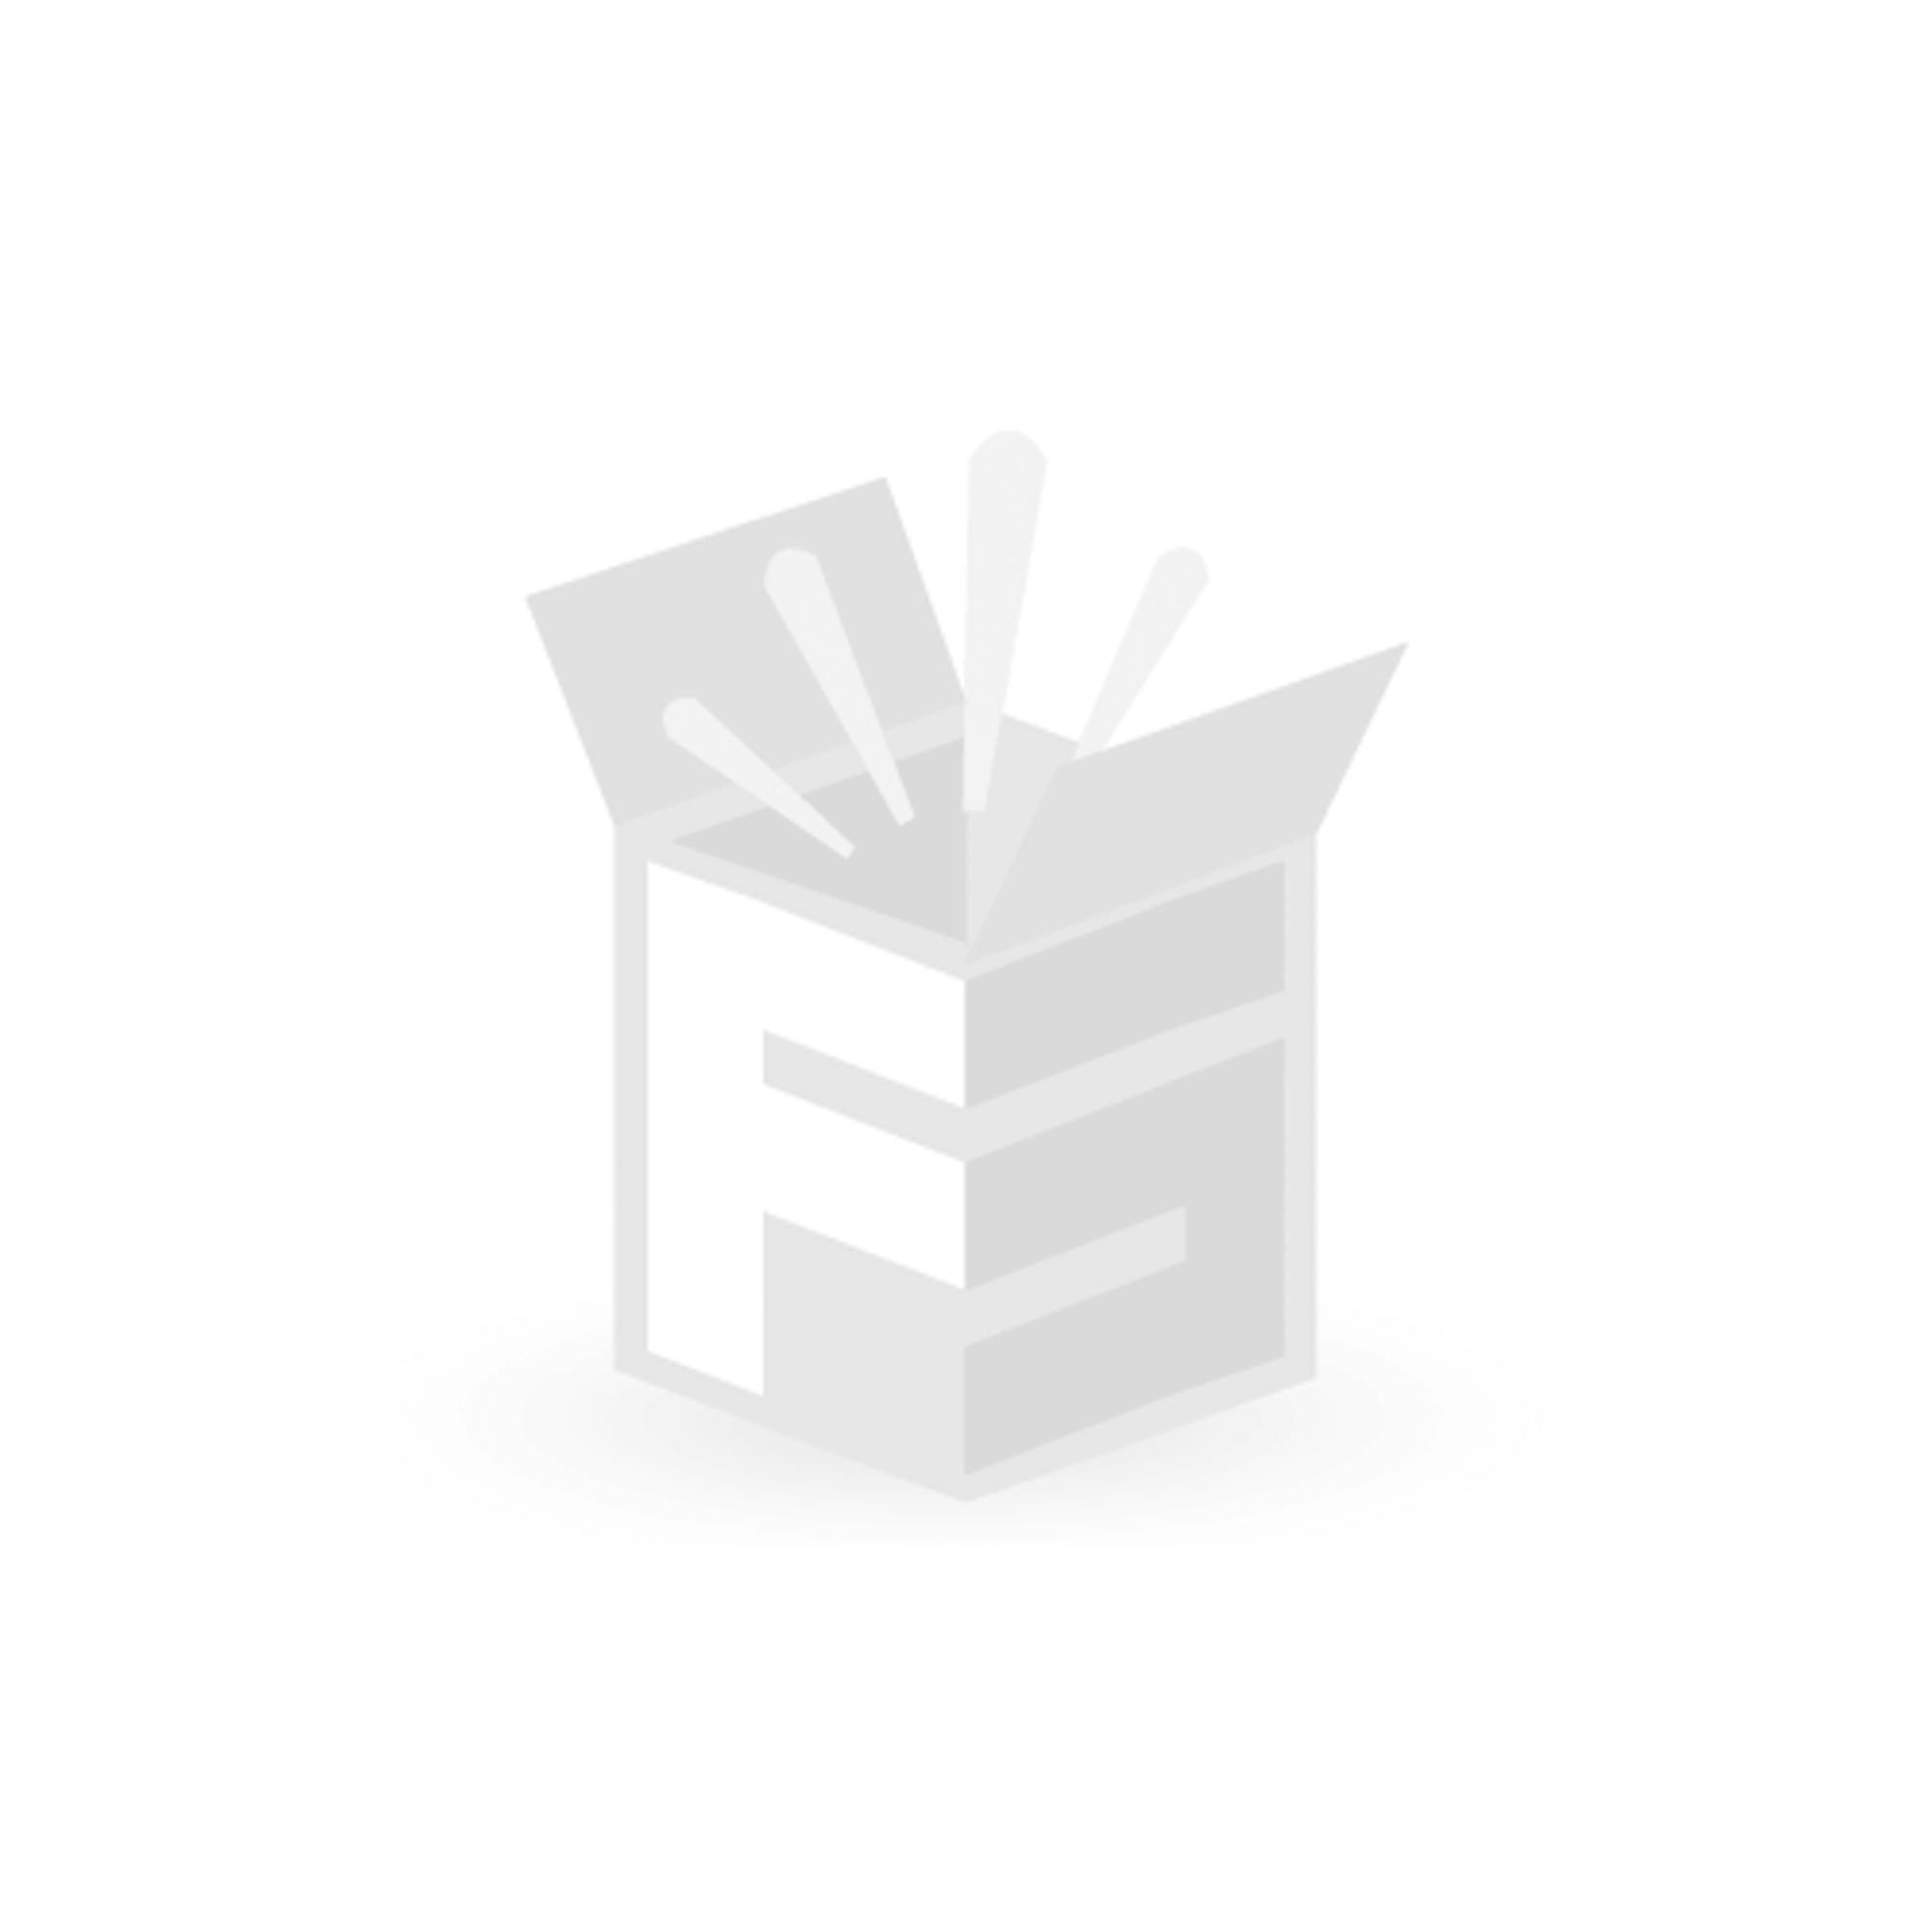 Contini höhenverstellbarer Bürotisch 160 x 80 cm, Ahorn / Gestell dunkelgrau